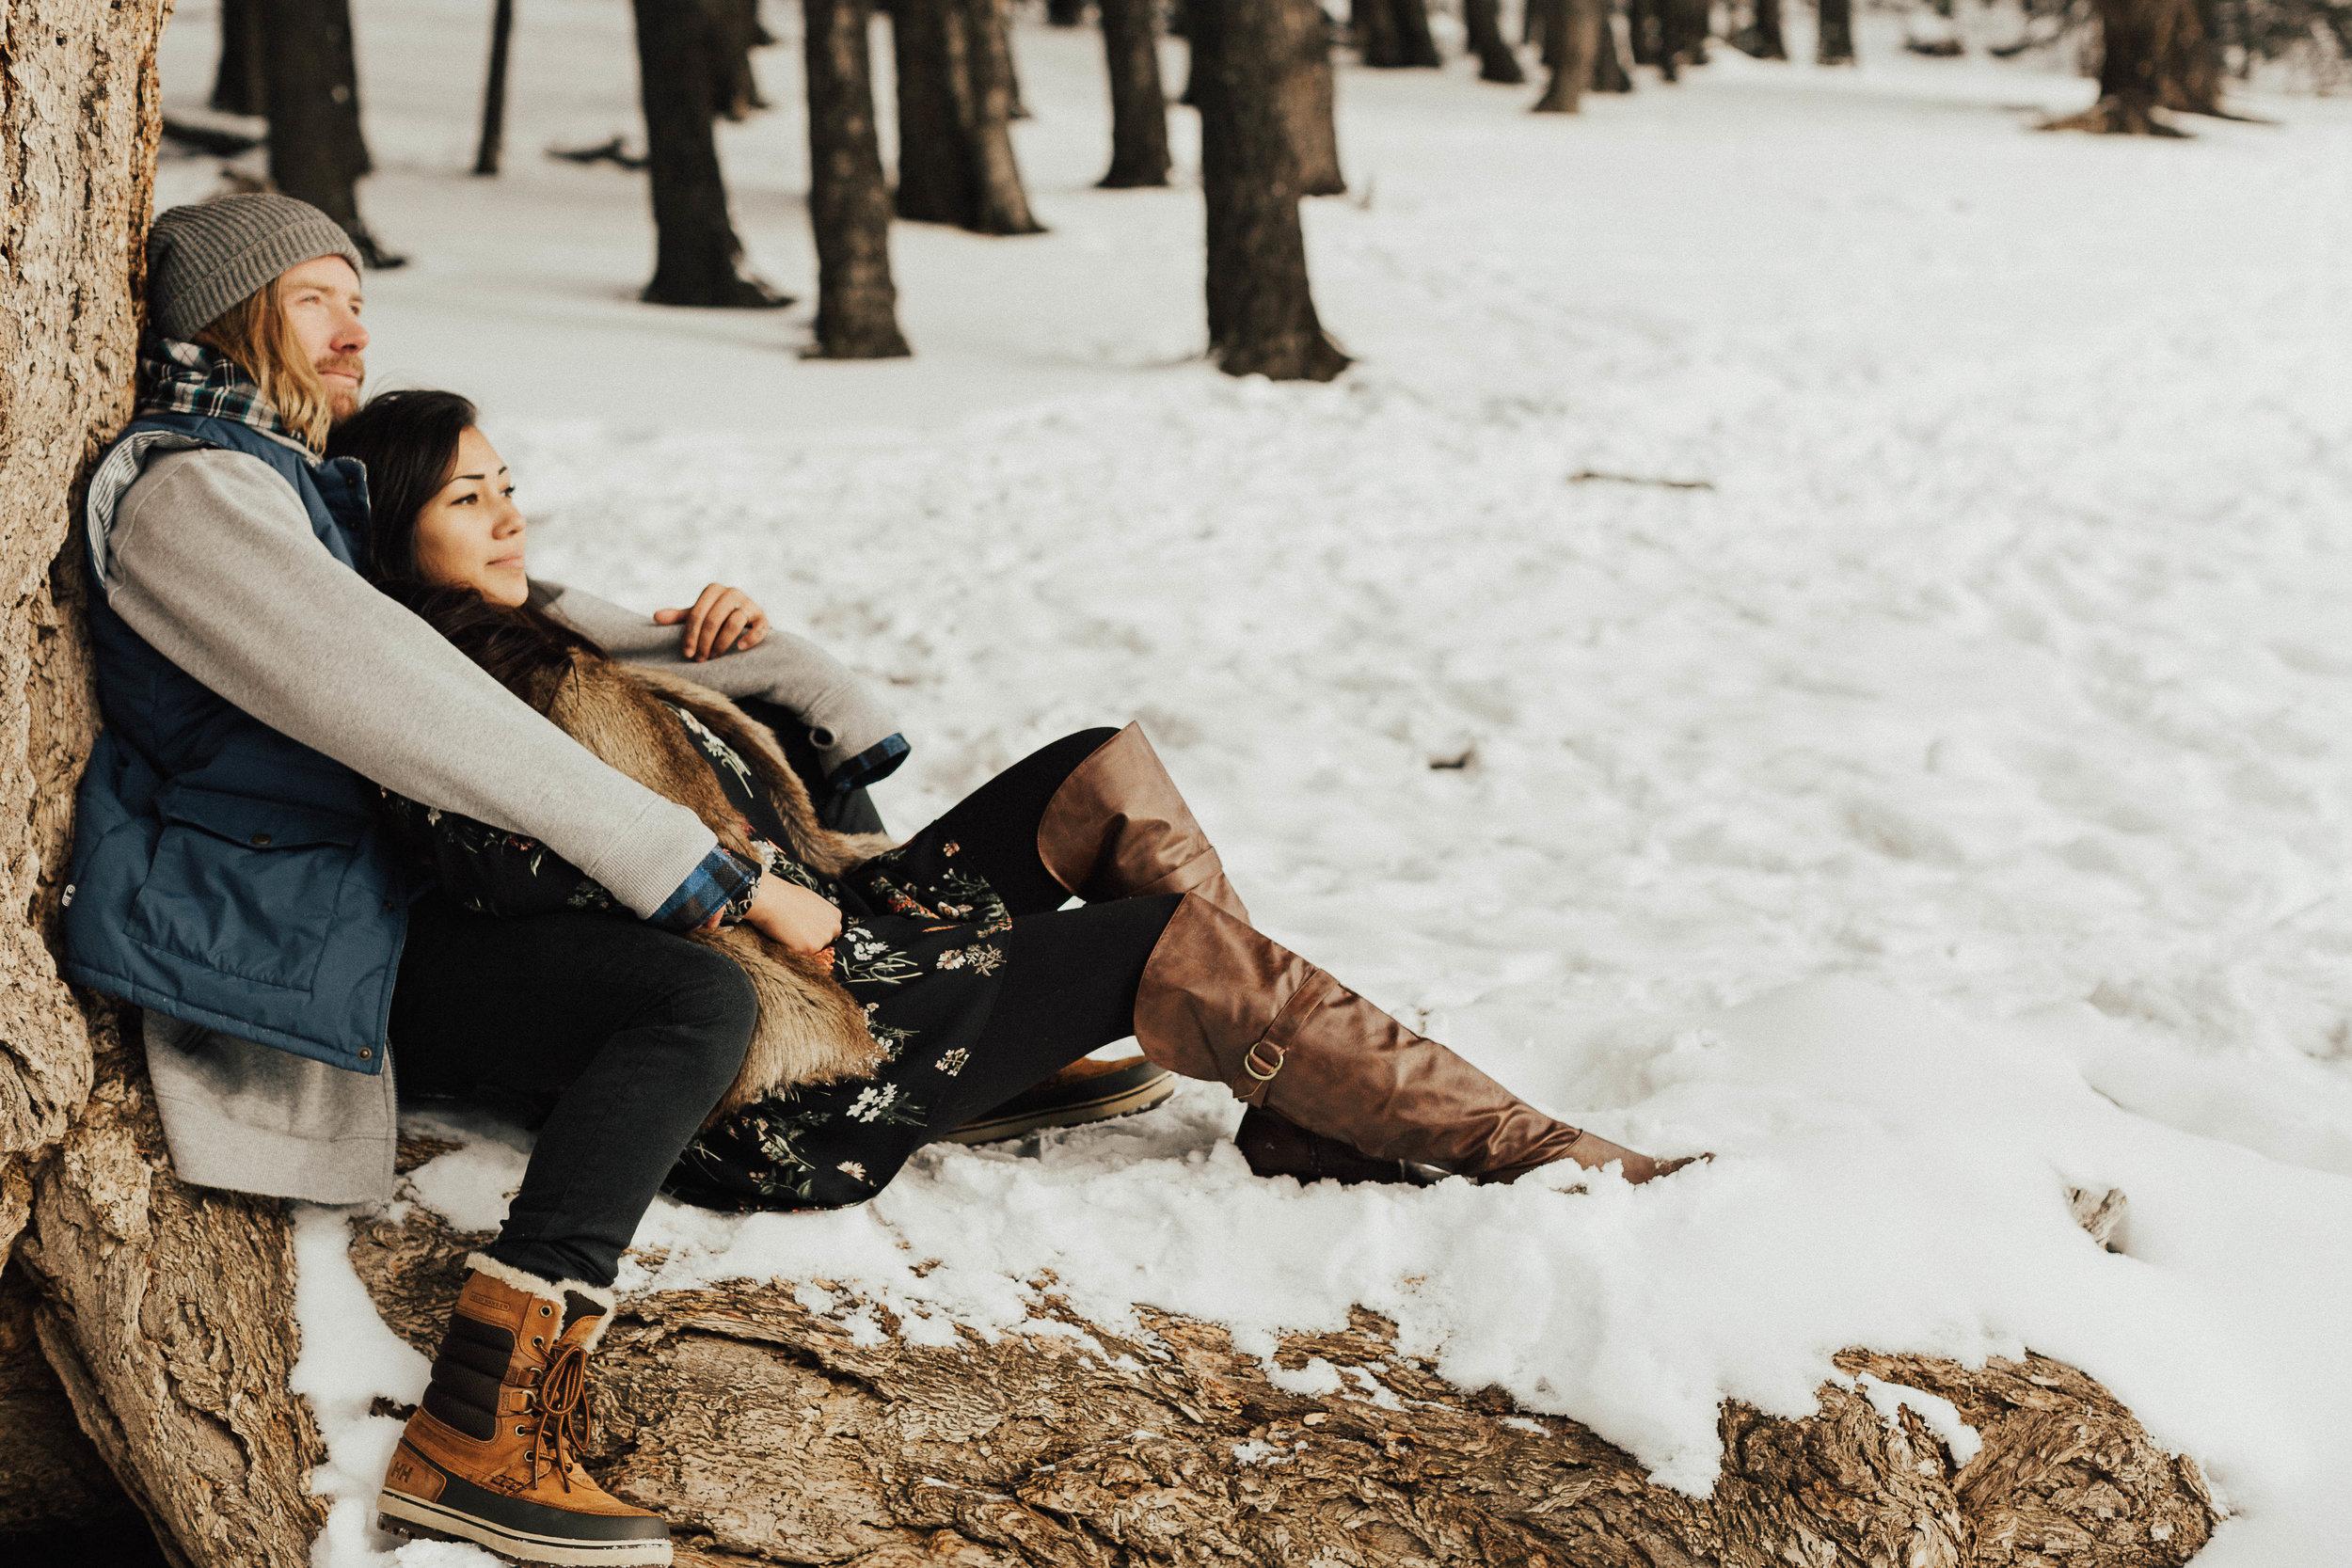 Banff Engagement Photographer - Winter Mountain Adventure Engagement Session - Michelle Larmand Photography-061